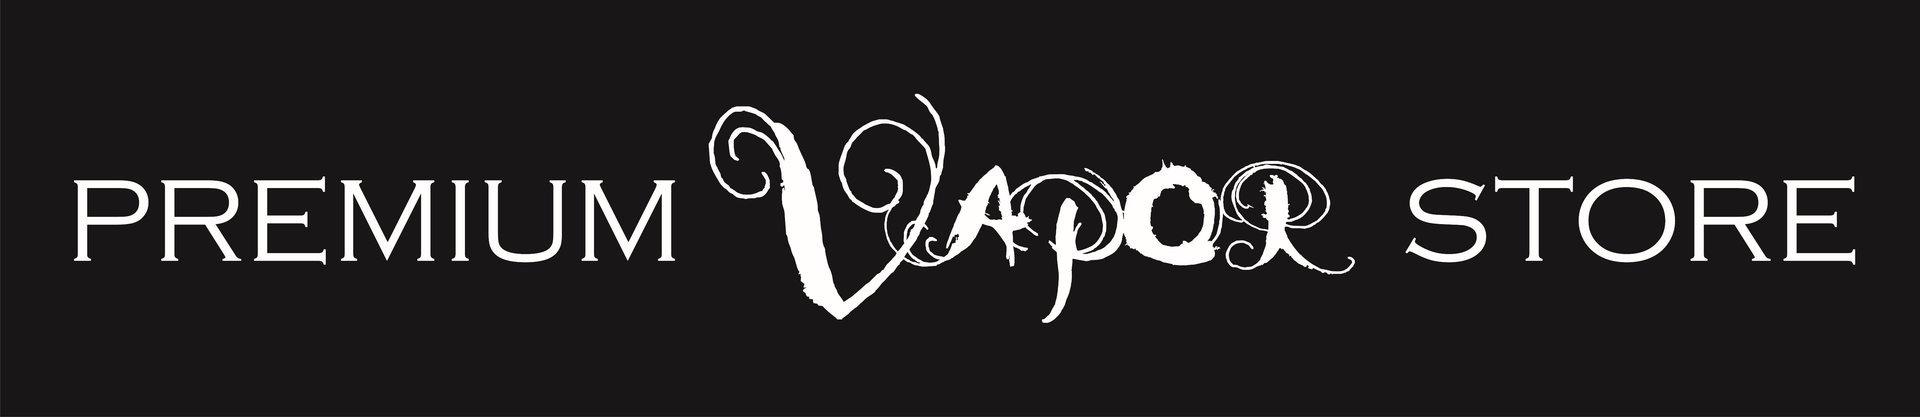 premium-vapor-store.jpg